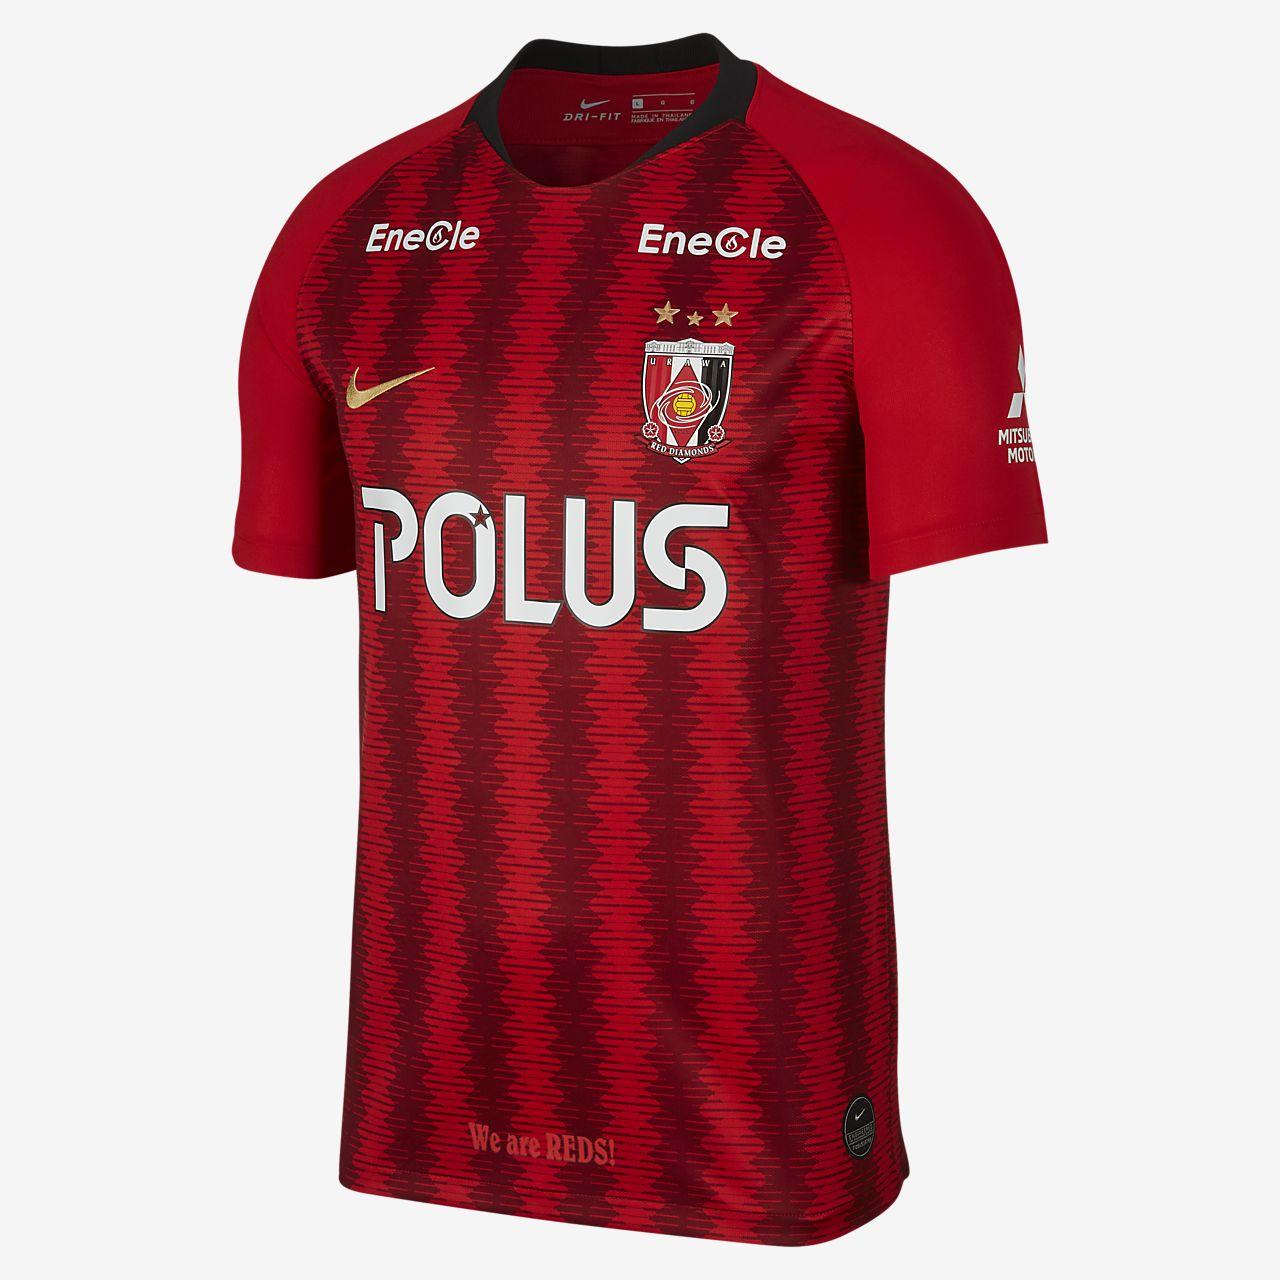 Urawa スタジアム 2019 メンズ ホーム ユニフォーム